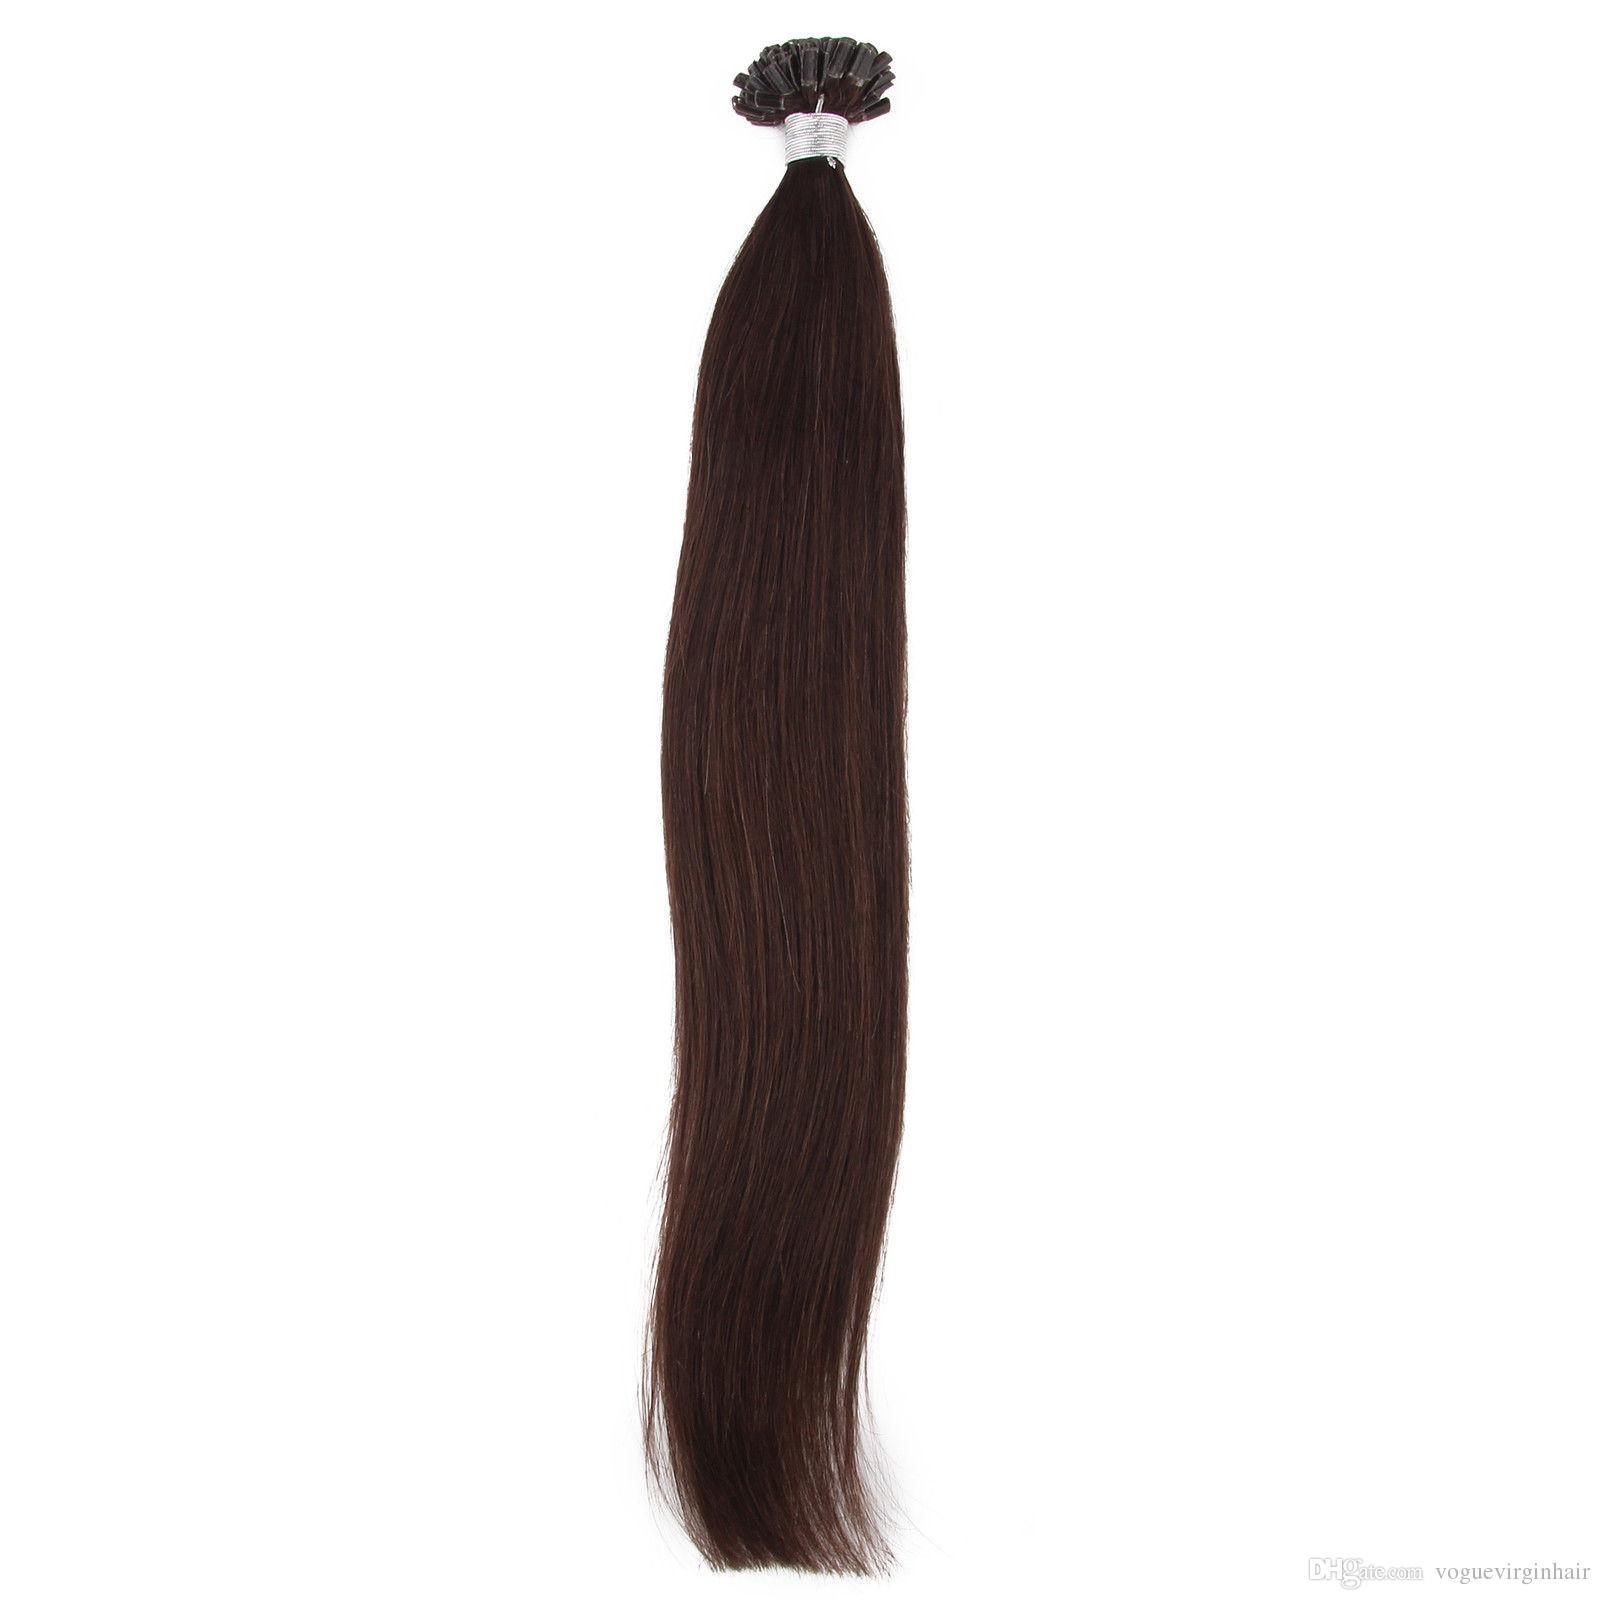 Brazilian virgin hair Straight 0.5g/strand U-Tip Hair Extensions Human Strands Pre-Bonded 16inch--26inch Nail Tip Pre-bonded Hair Extensions